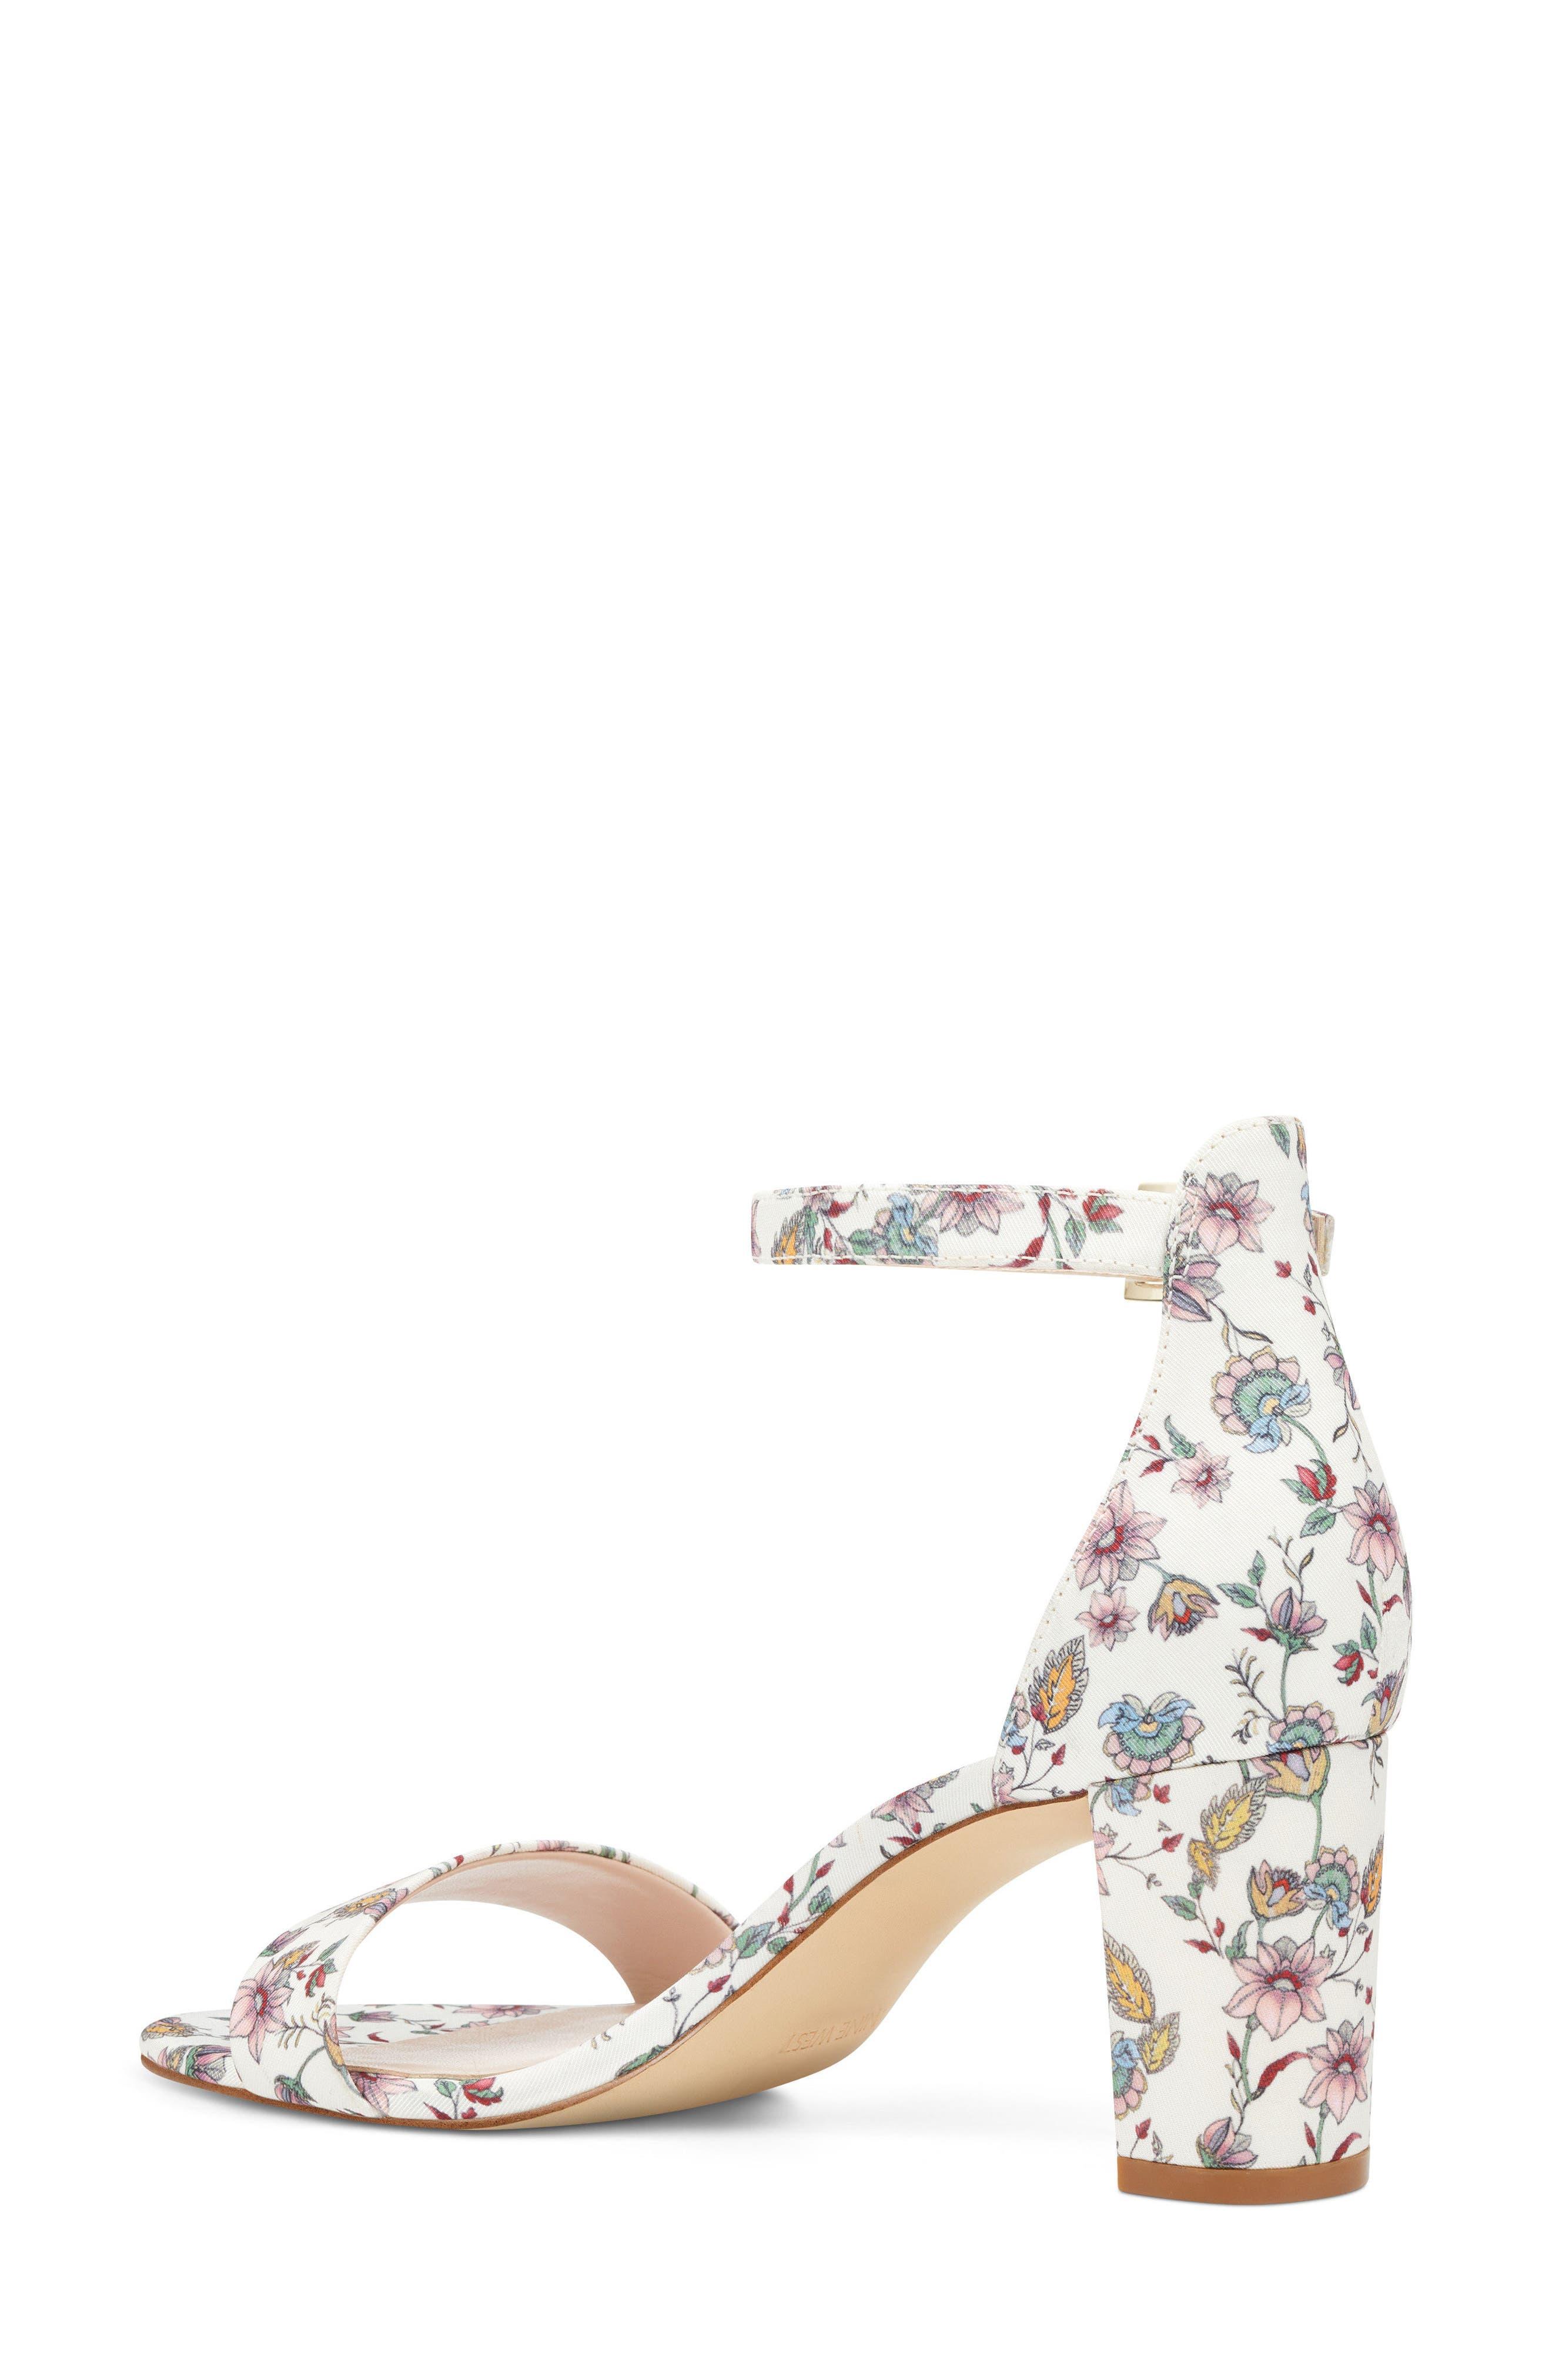 Pruce Ankle Strap Sandal,                             Alternate thumbnail 2, color,                             White Multi